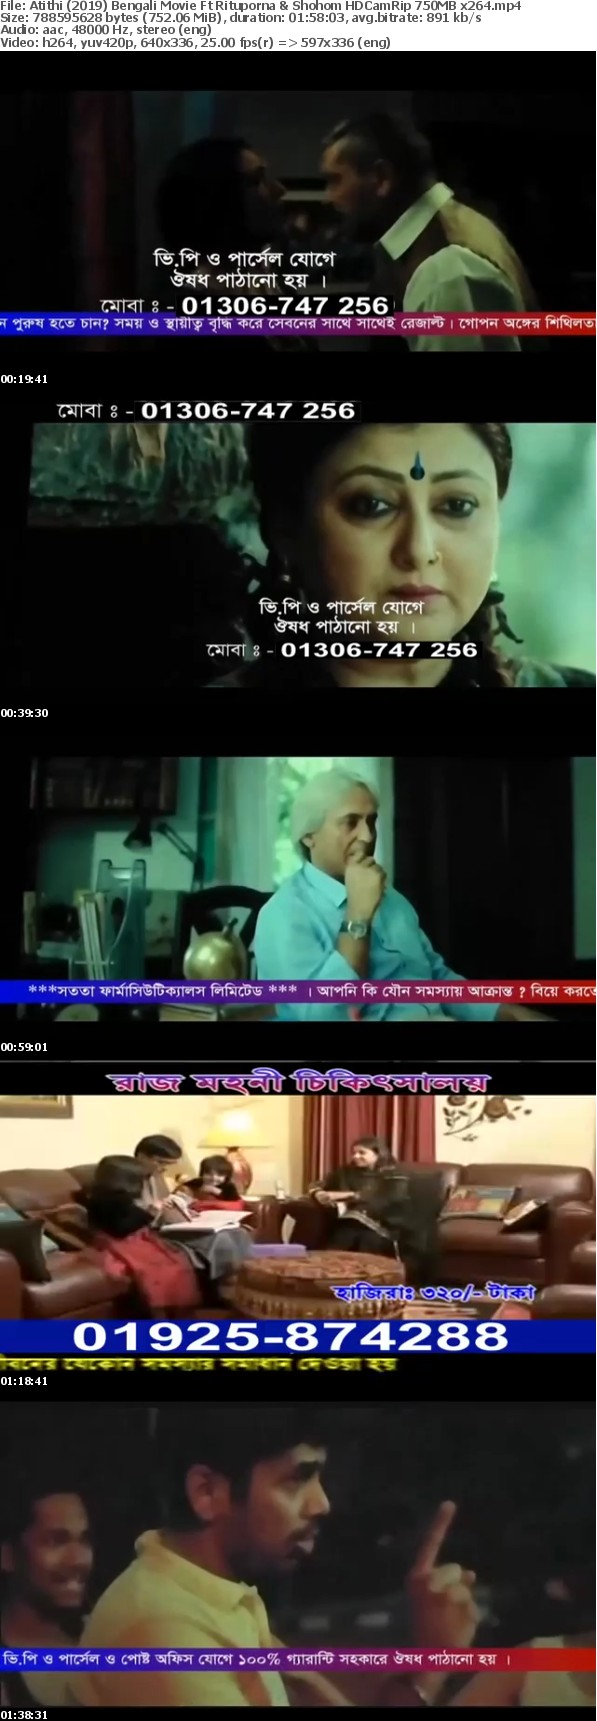 Atithi 2019 Bengali Movie Ft Rituporna & Shohom HDCamRip 750MB x264